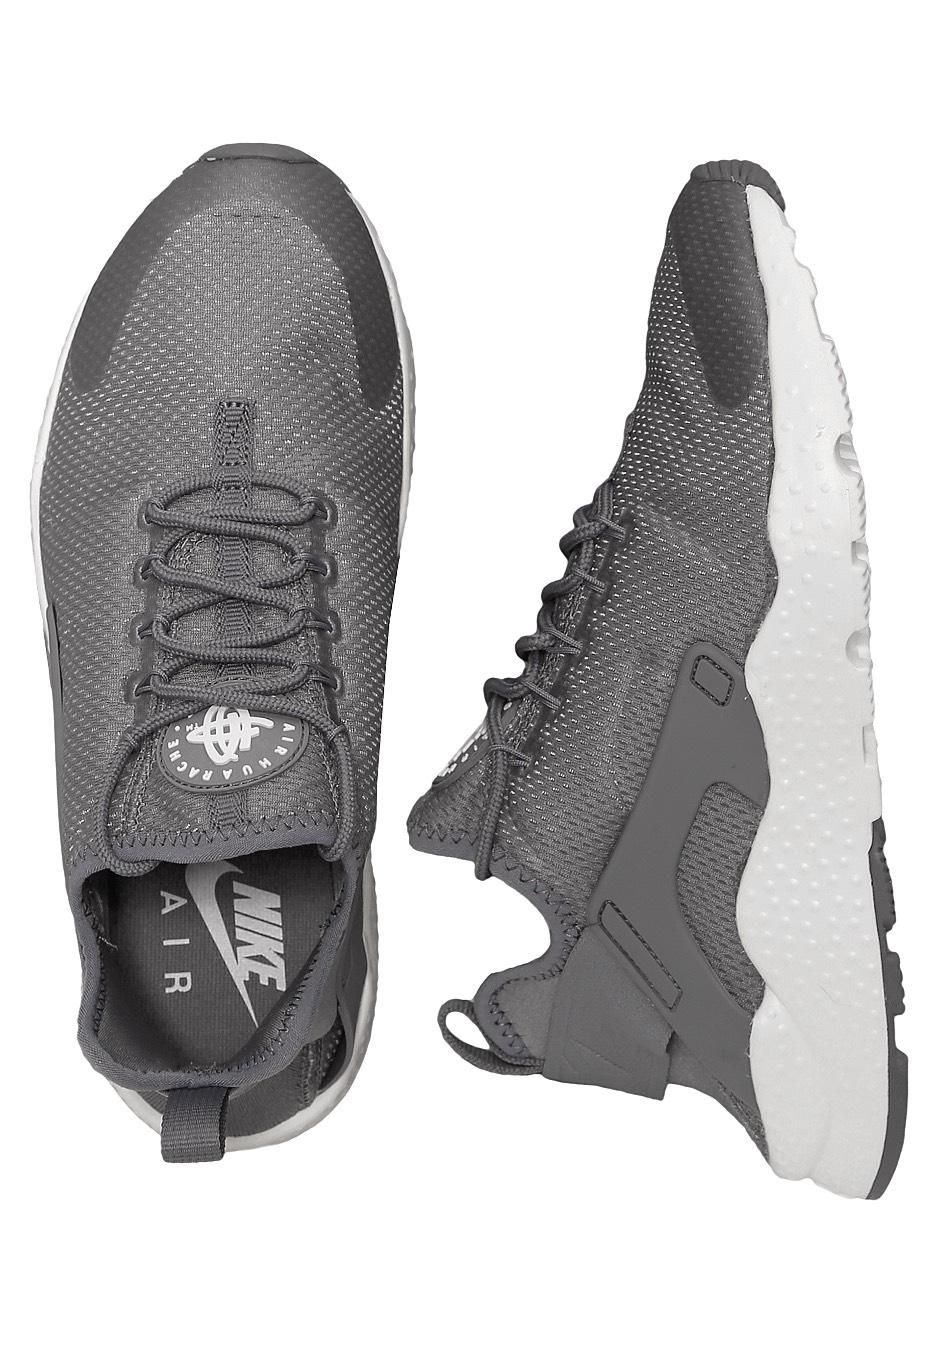 93c0ba55cb5f Nike - Air Huarache Run Cool Grey Cool Grey Summit White - Girl Shoes -  Impericon.com US